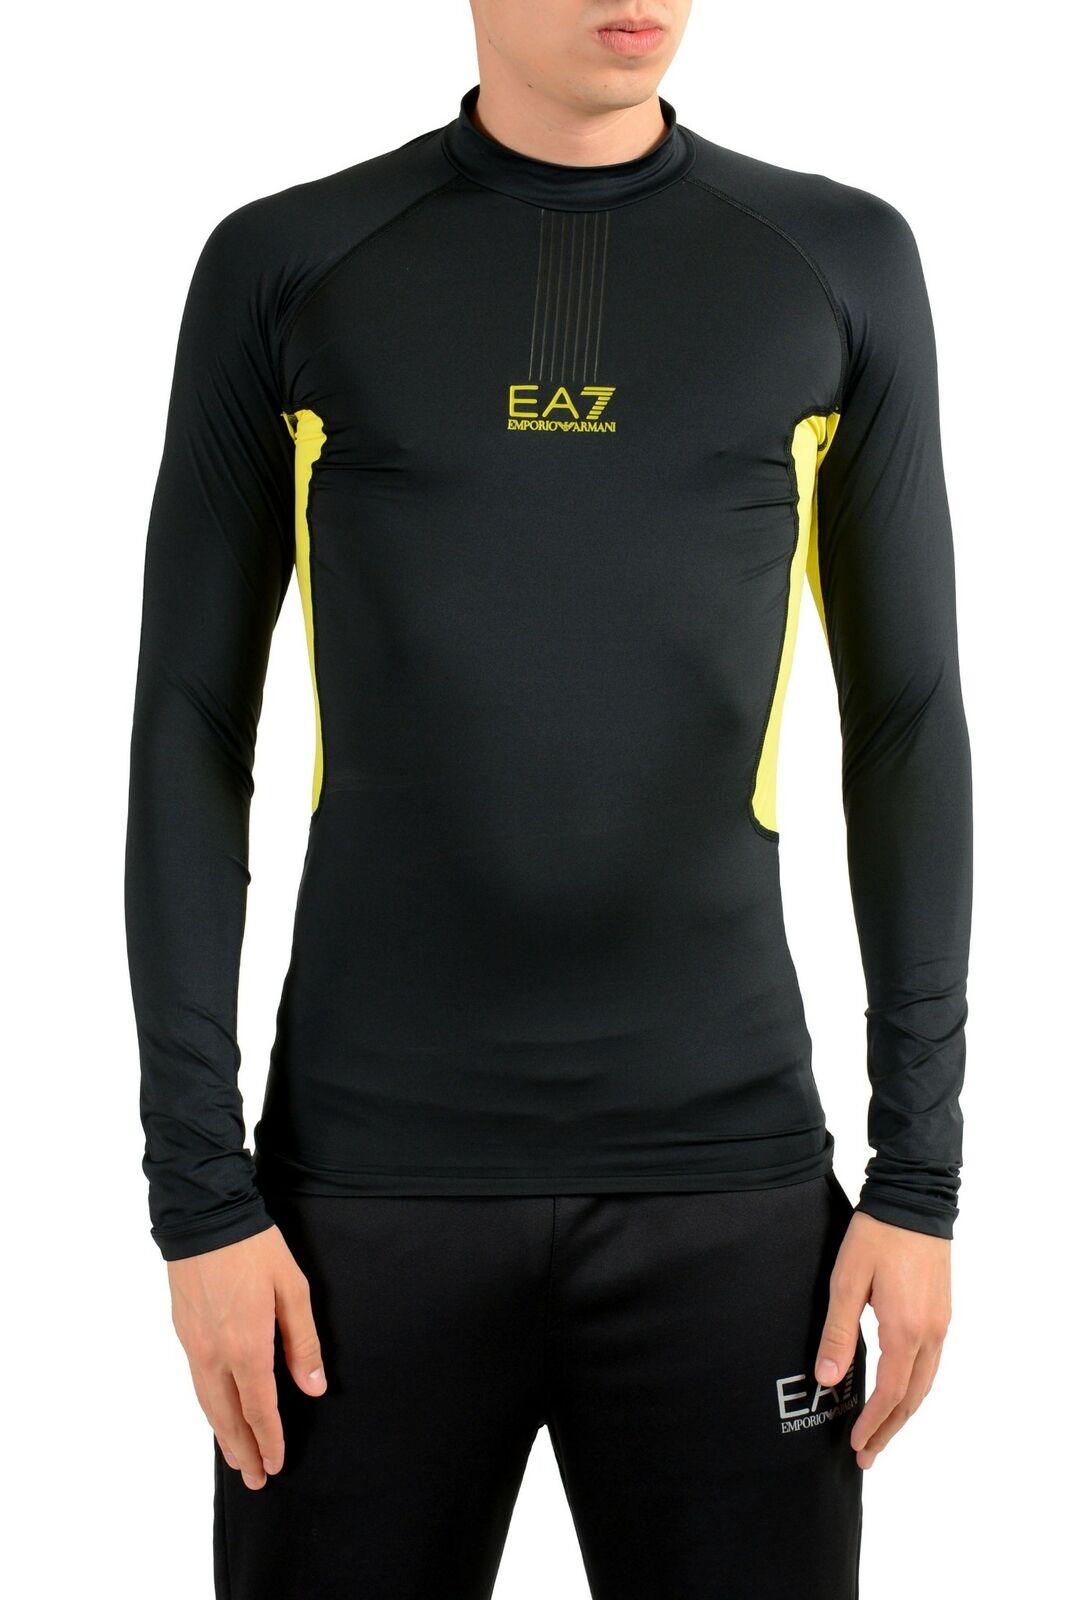 "Emporio Armani EA7 ""Tech M"" Negro para Hombre  Cuello Alto Manga Larga T-Shirt  autentico en linea"